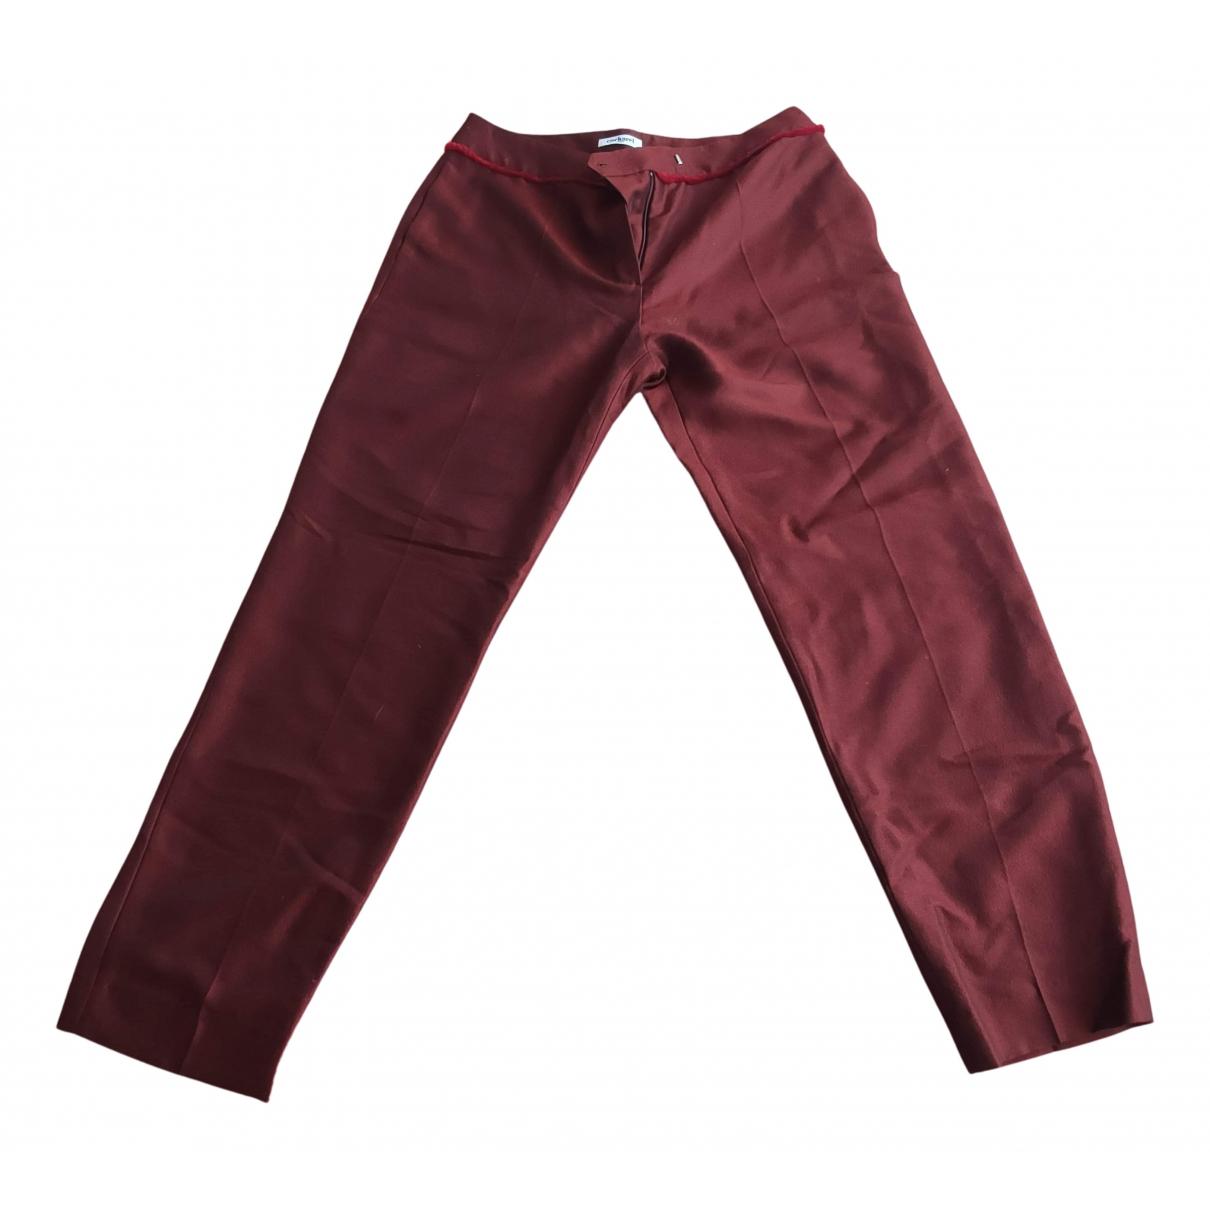 Cacharel N Burgundy Wool Trousers for Women M International